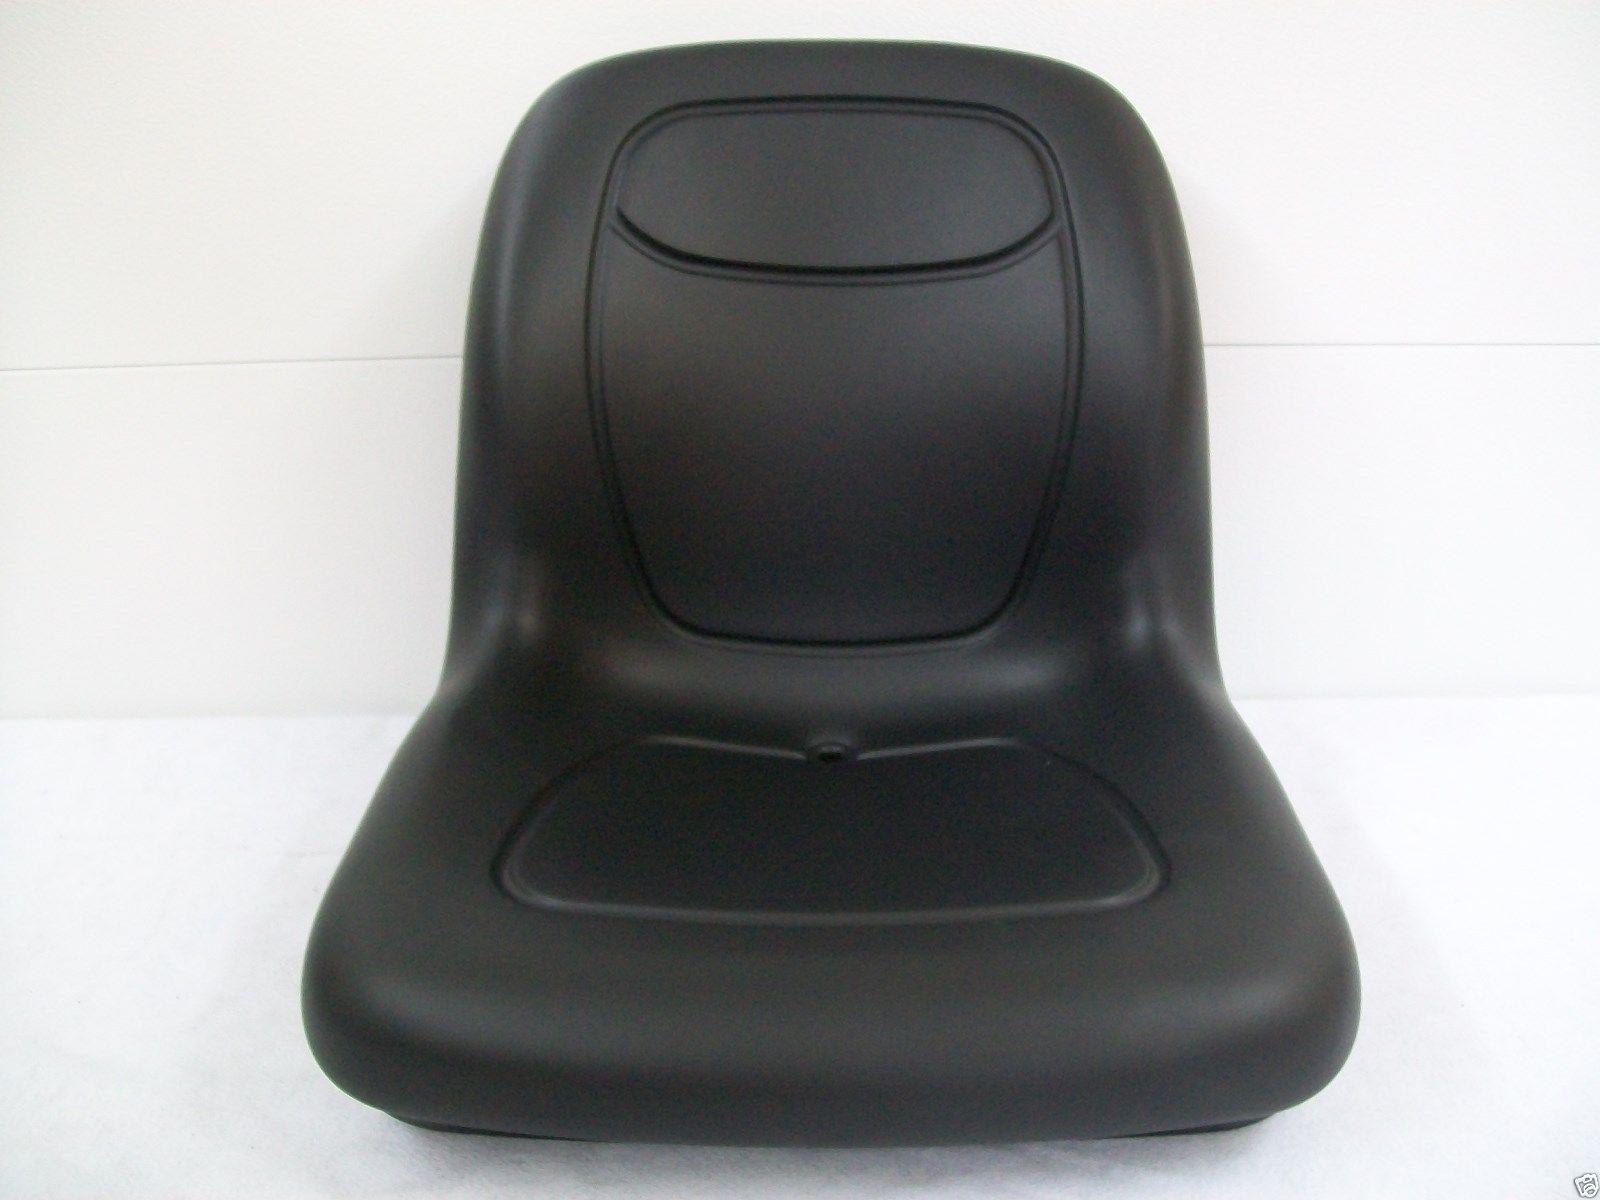 BLACK SEAT FITS KUBOTA BX1850, BX2350, BX1860, BX2360, BX24